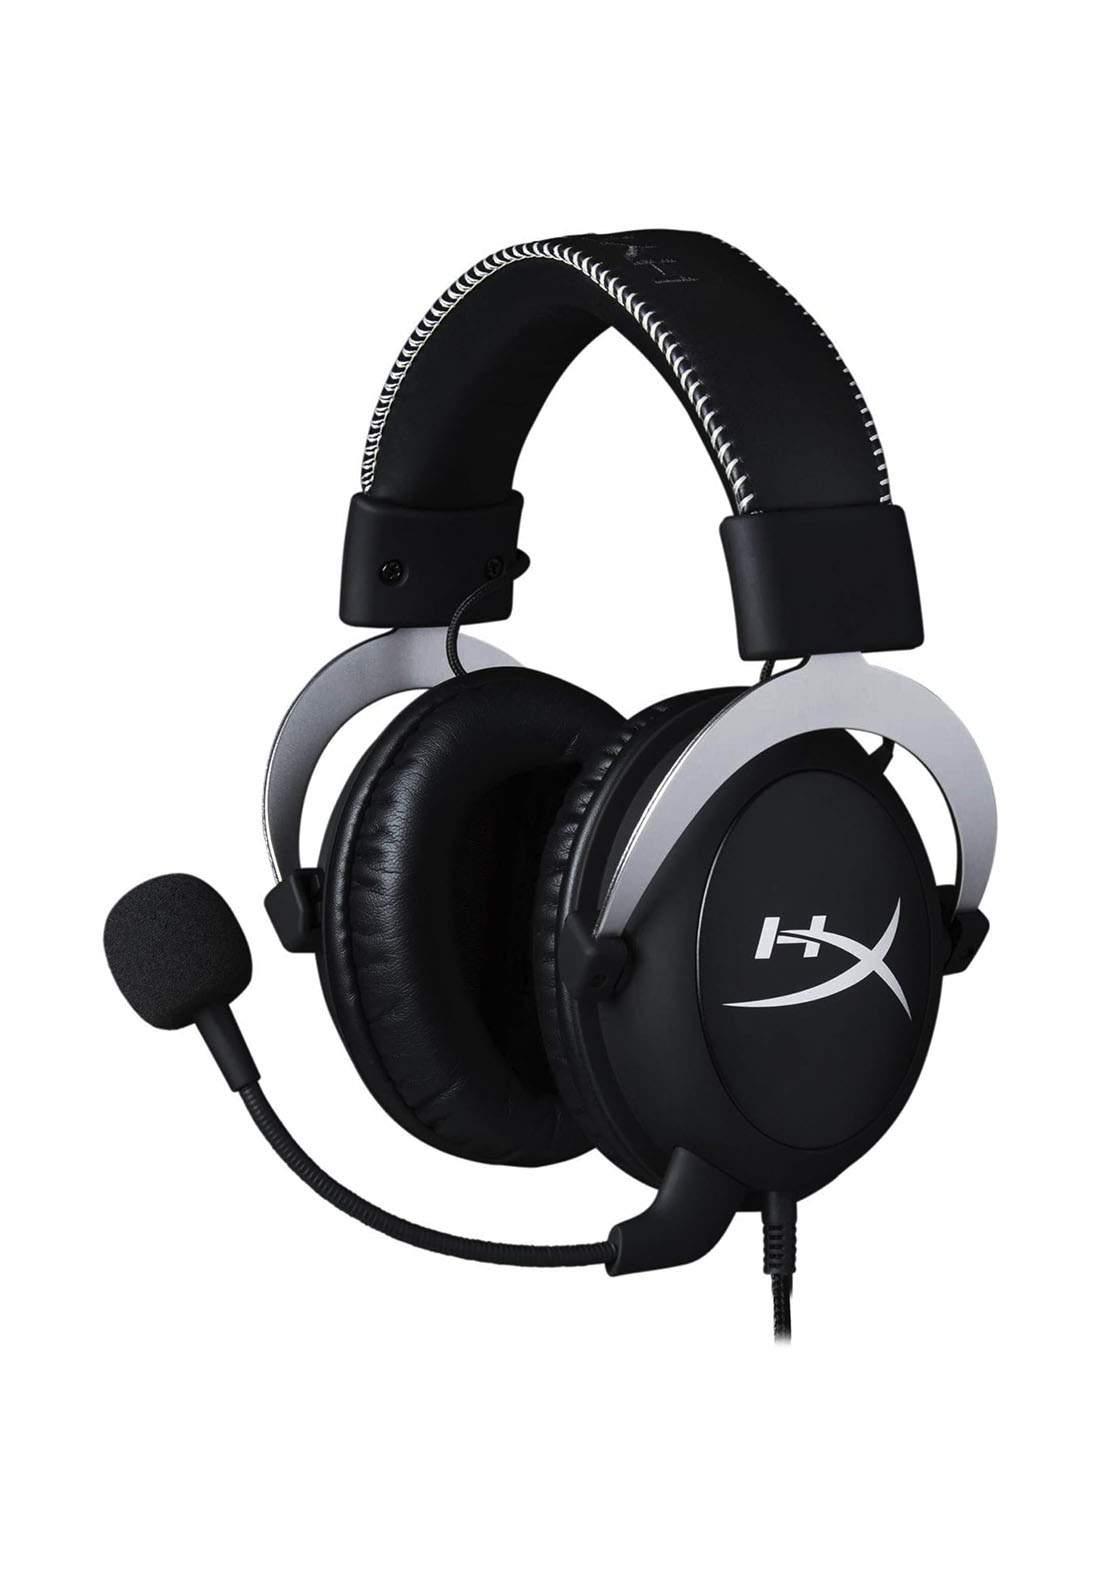 HyperX CloudX Xbox Wired Gaming Headset - Black سماعة سلكية